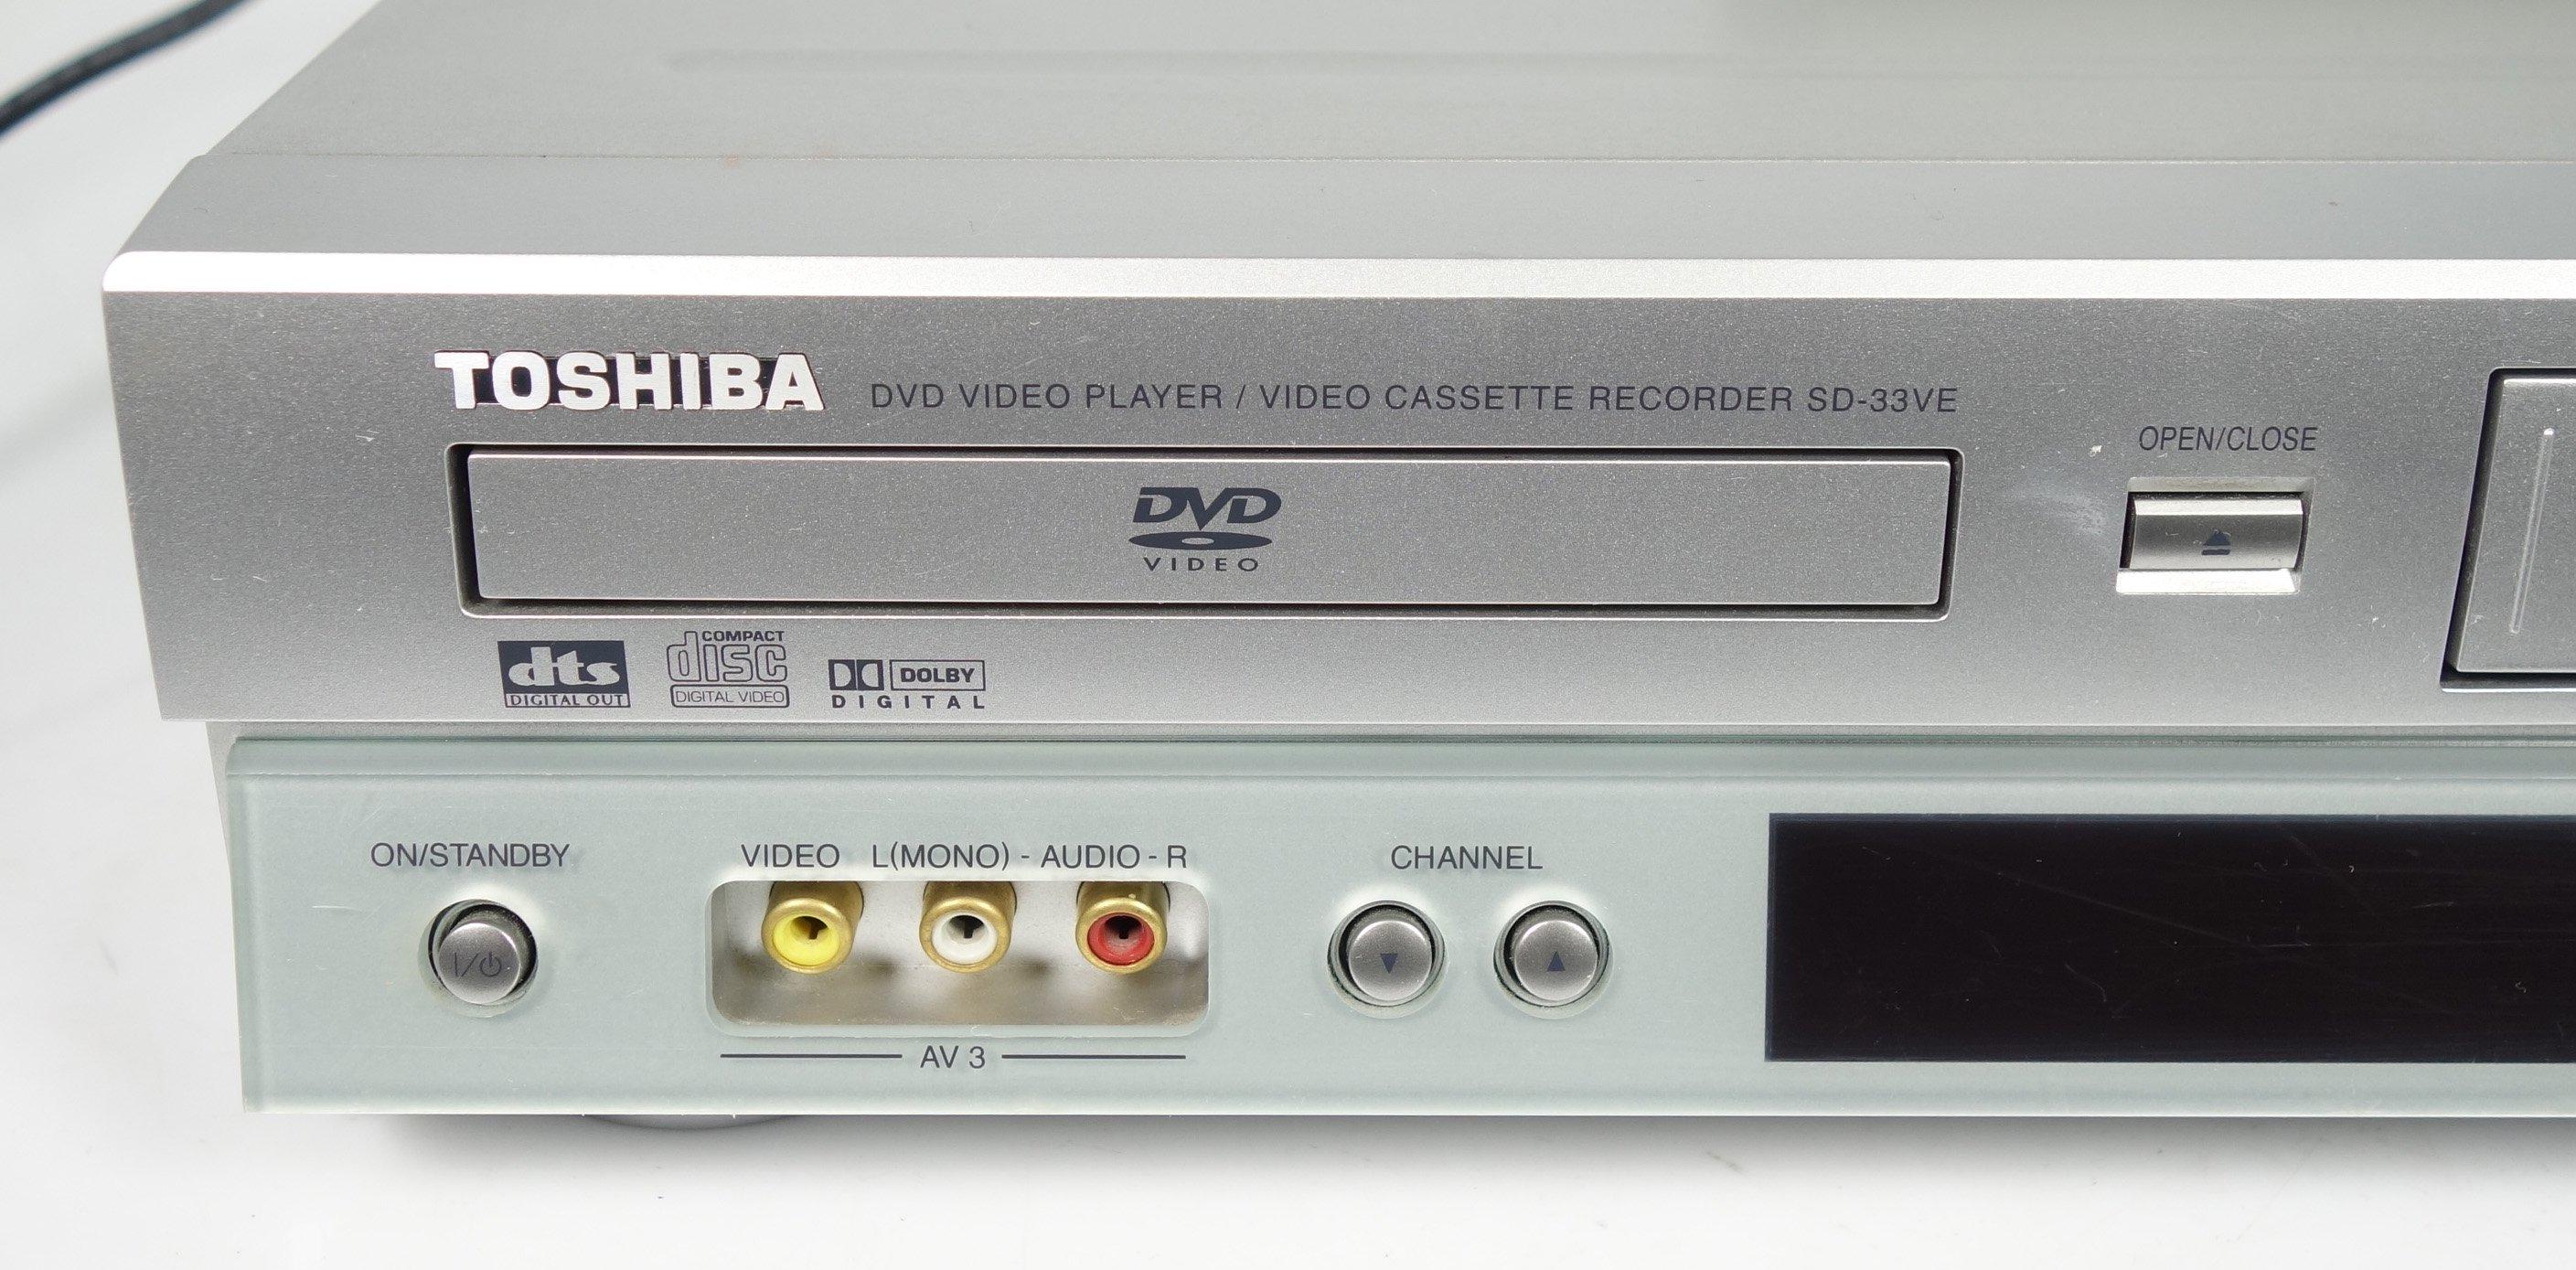 toshiba sd 33ve vhs videorecorder dvd player. Black Bedroom Furniture Sets. Home Design Ideas